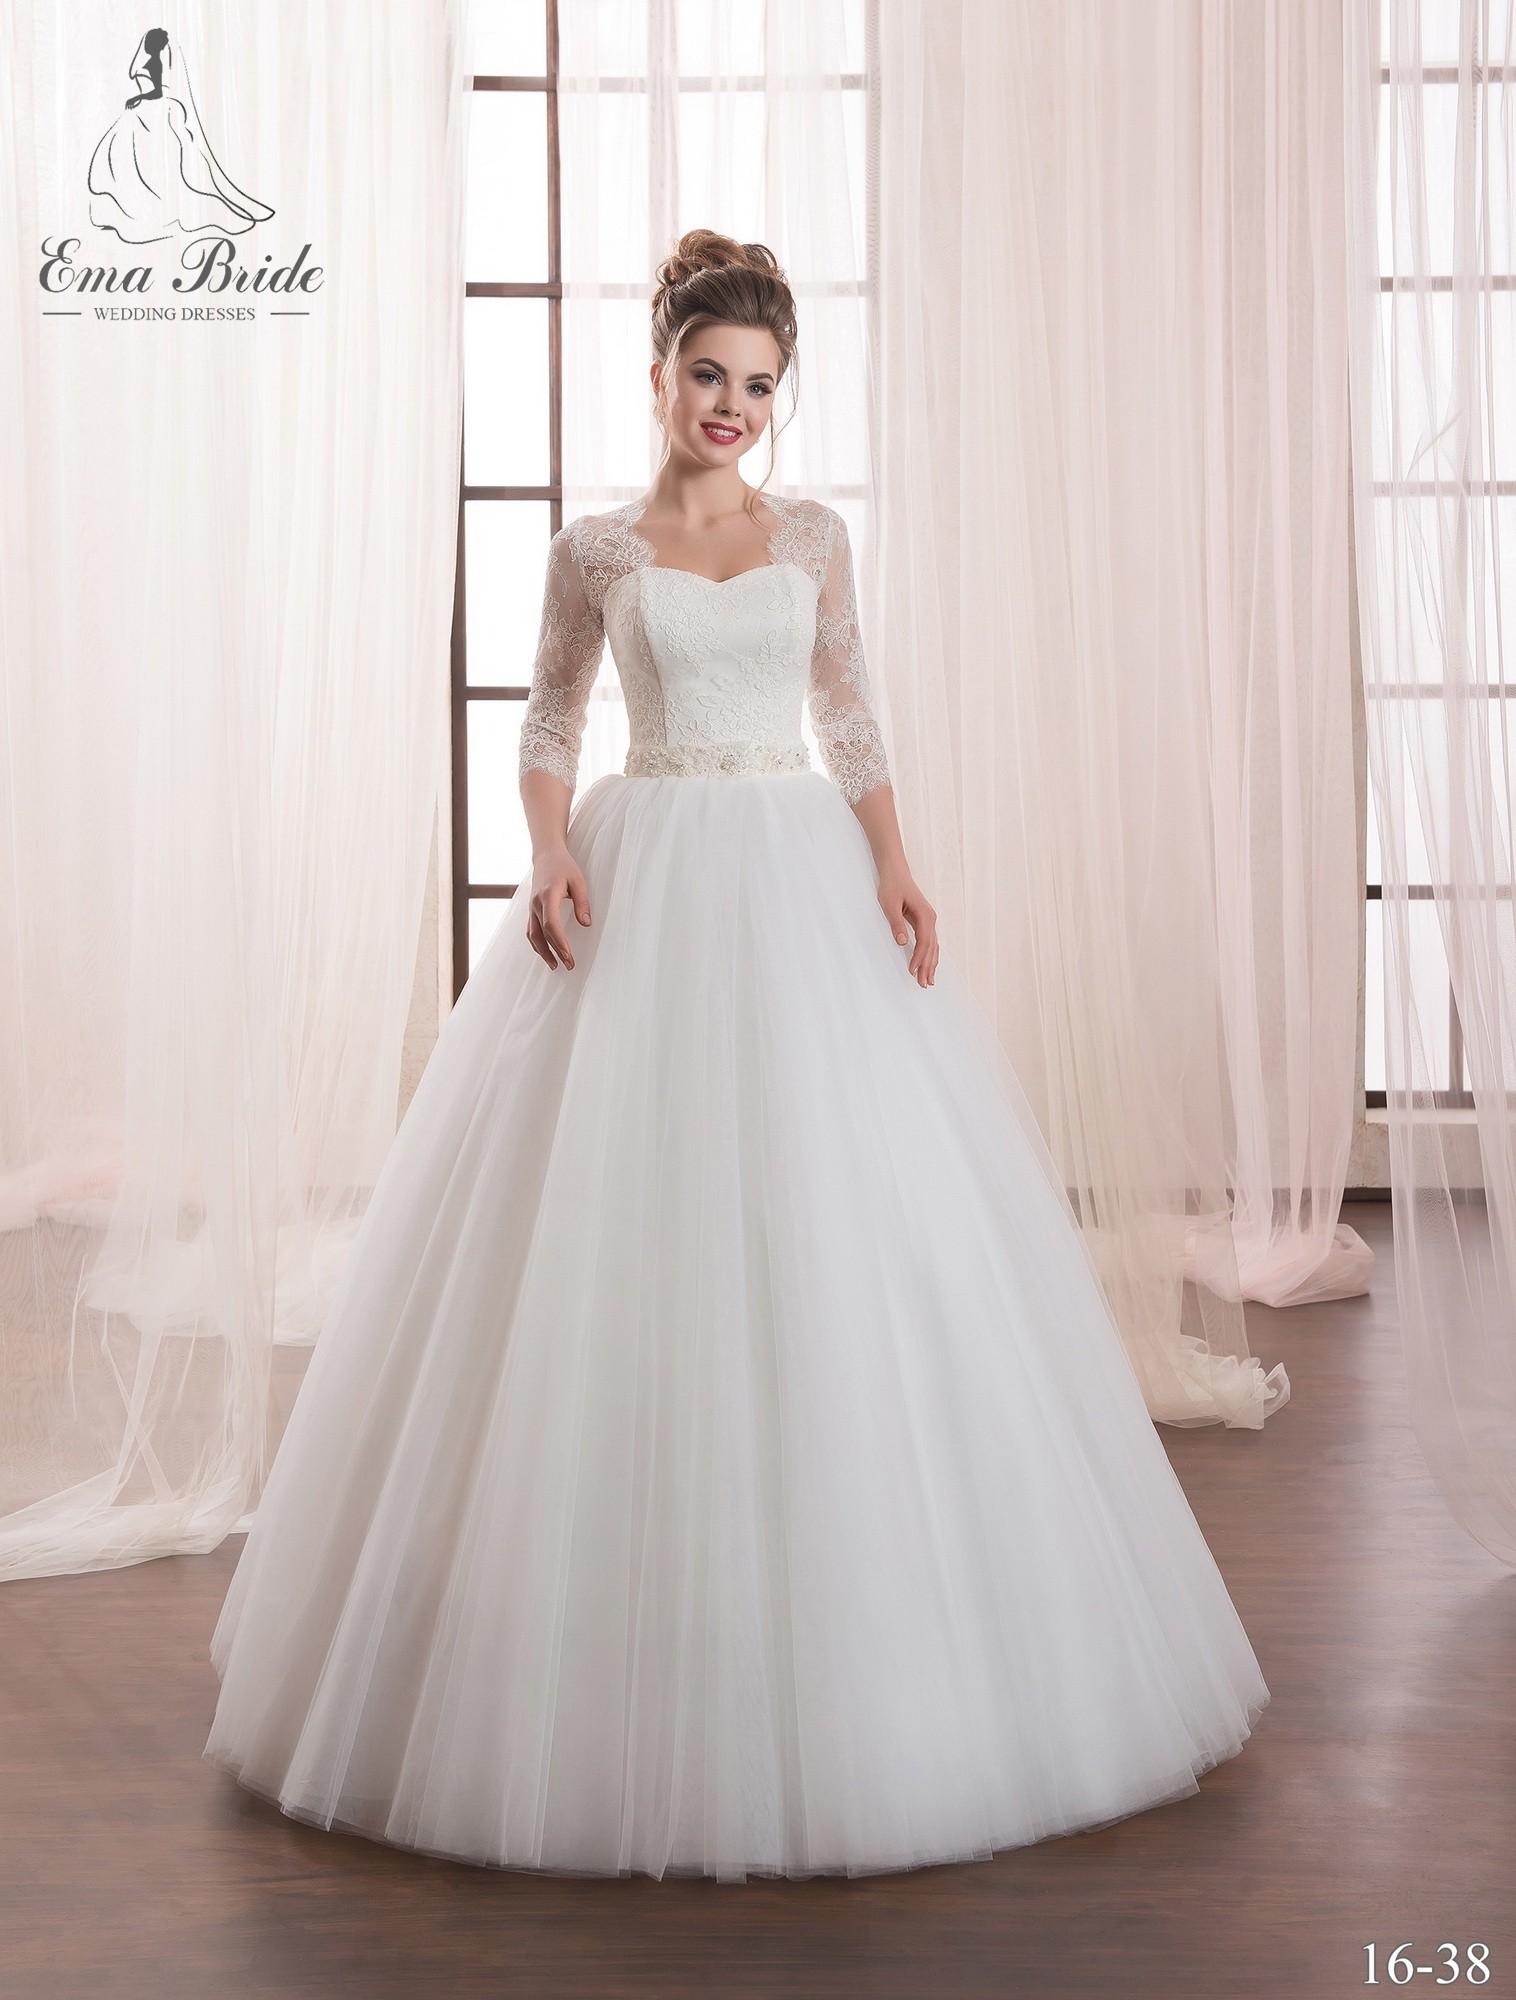 Wedding Dresses 16-38